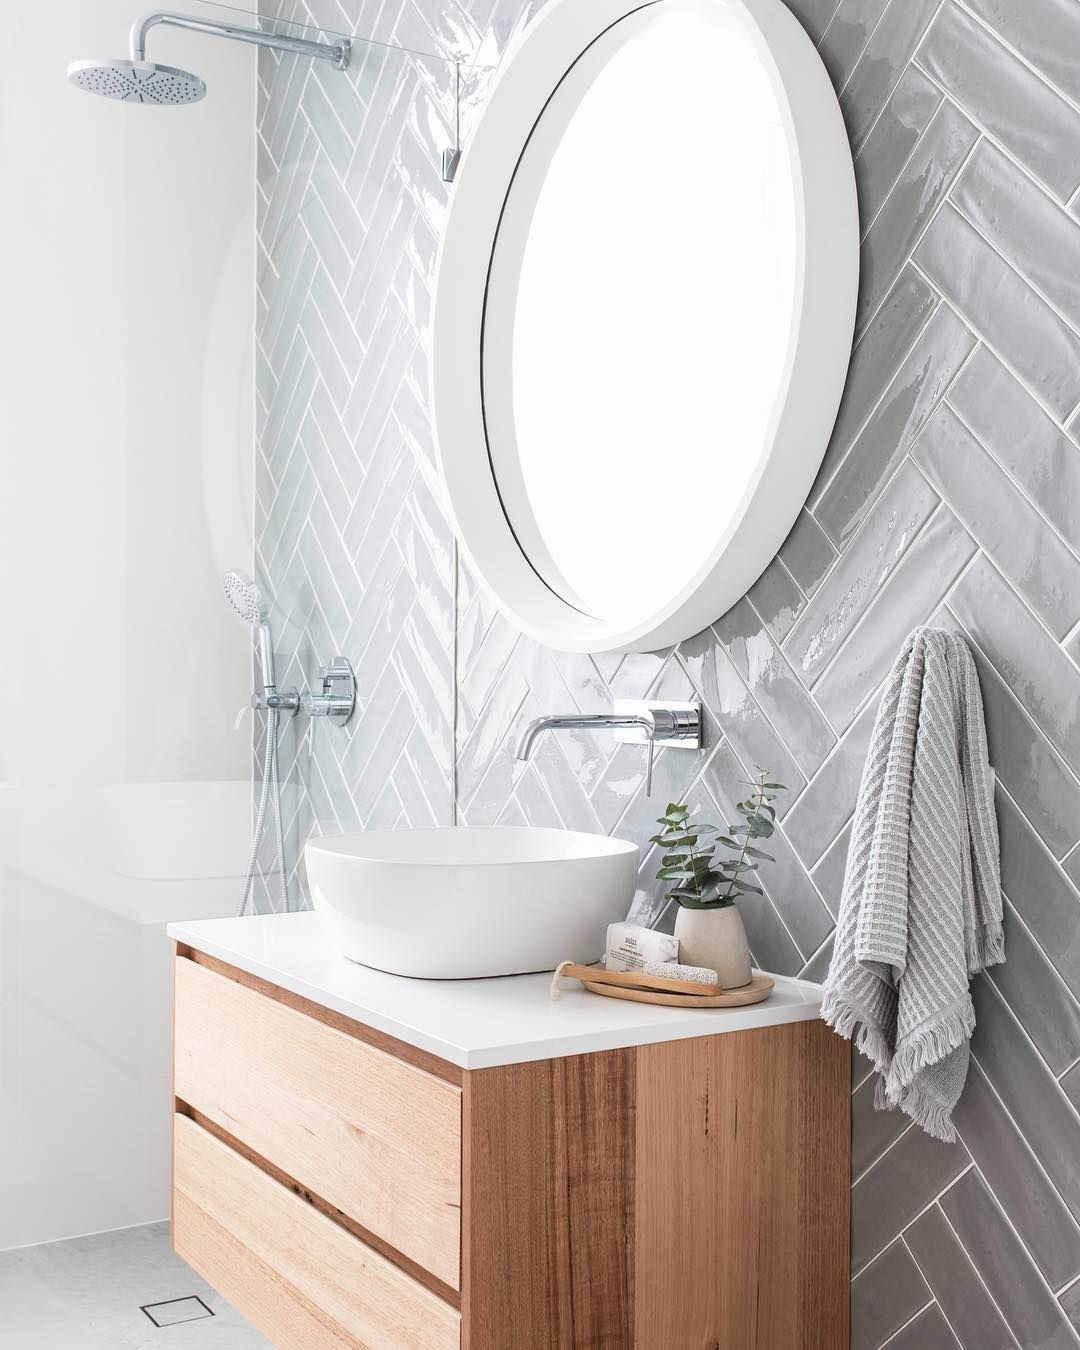 T H E S T A B L E S On Instagram Let The Bathroom Spam Begin Episode Two Launched Last Night So If Y Bathroom Interior Simple Bathroom Minimalist Bathroom